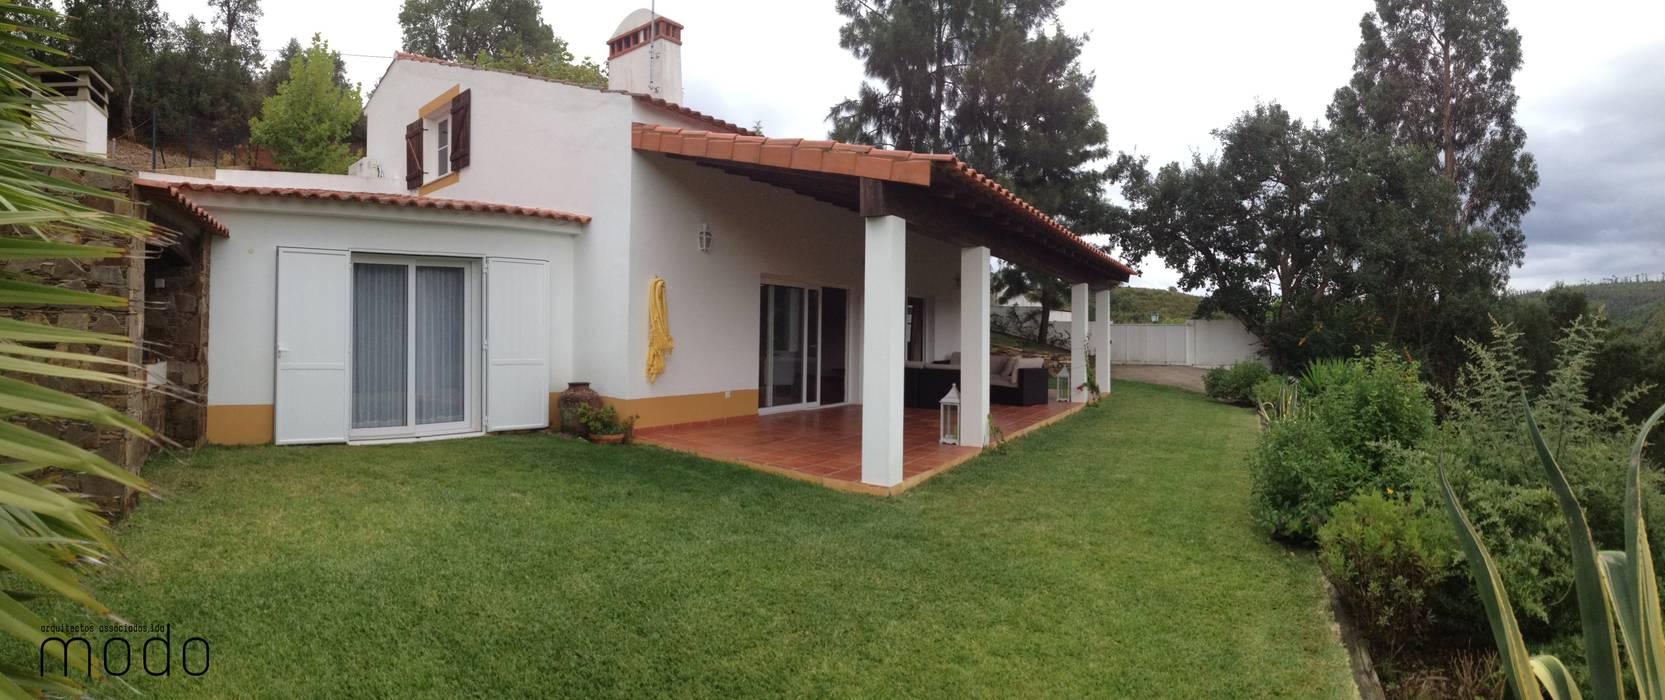 Modo Arquitectos Associados บ้านและที่อยู่อาศัย เซรามิค White